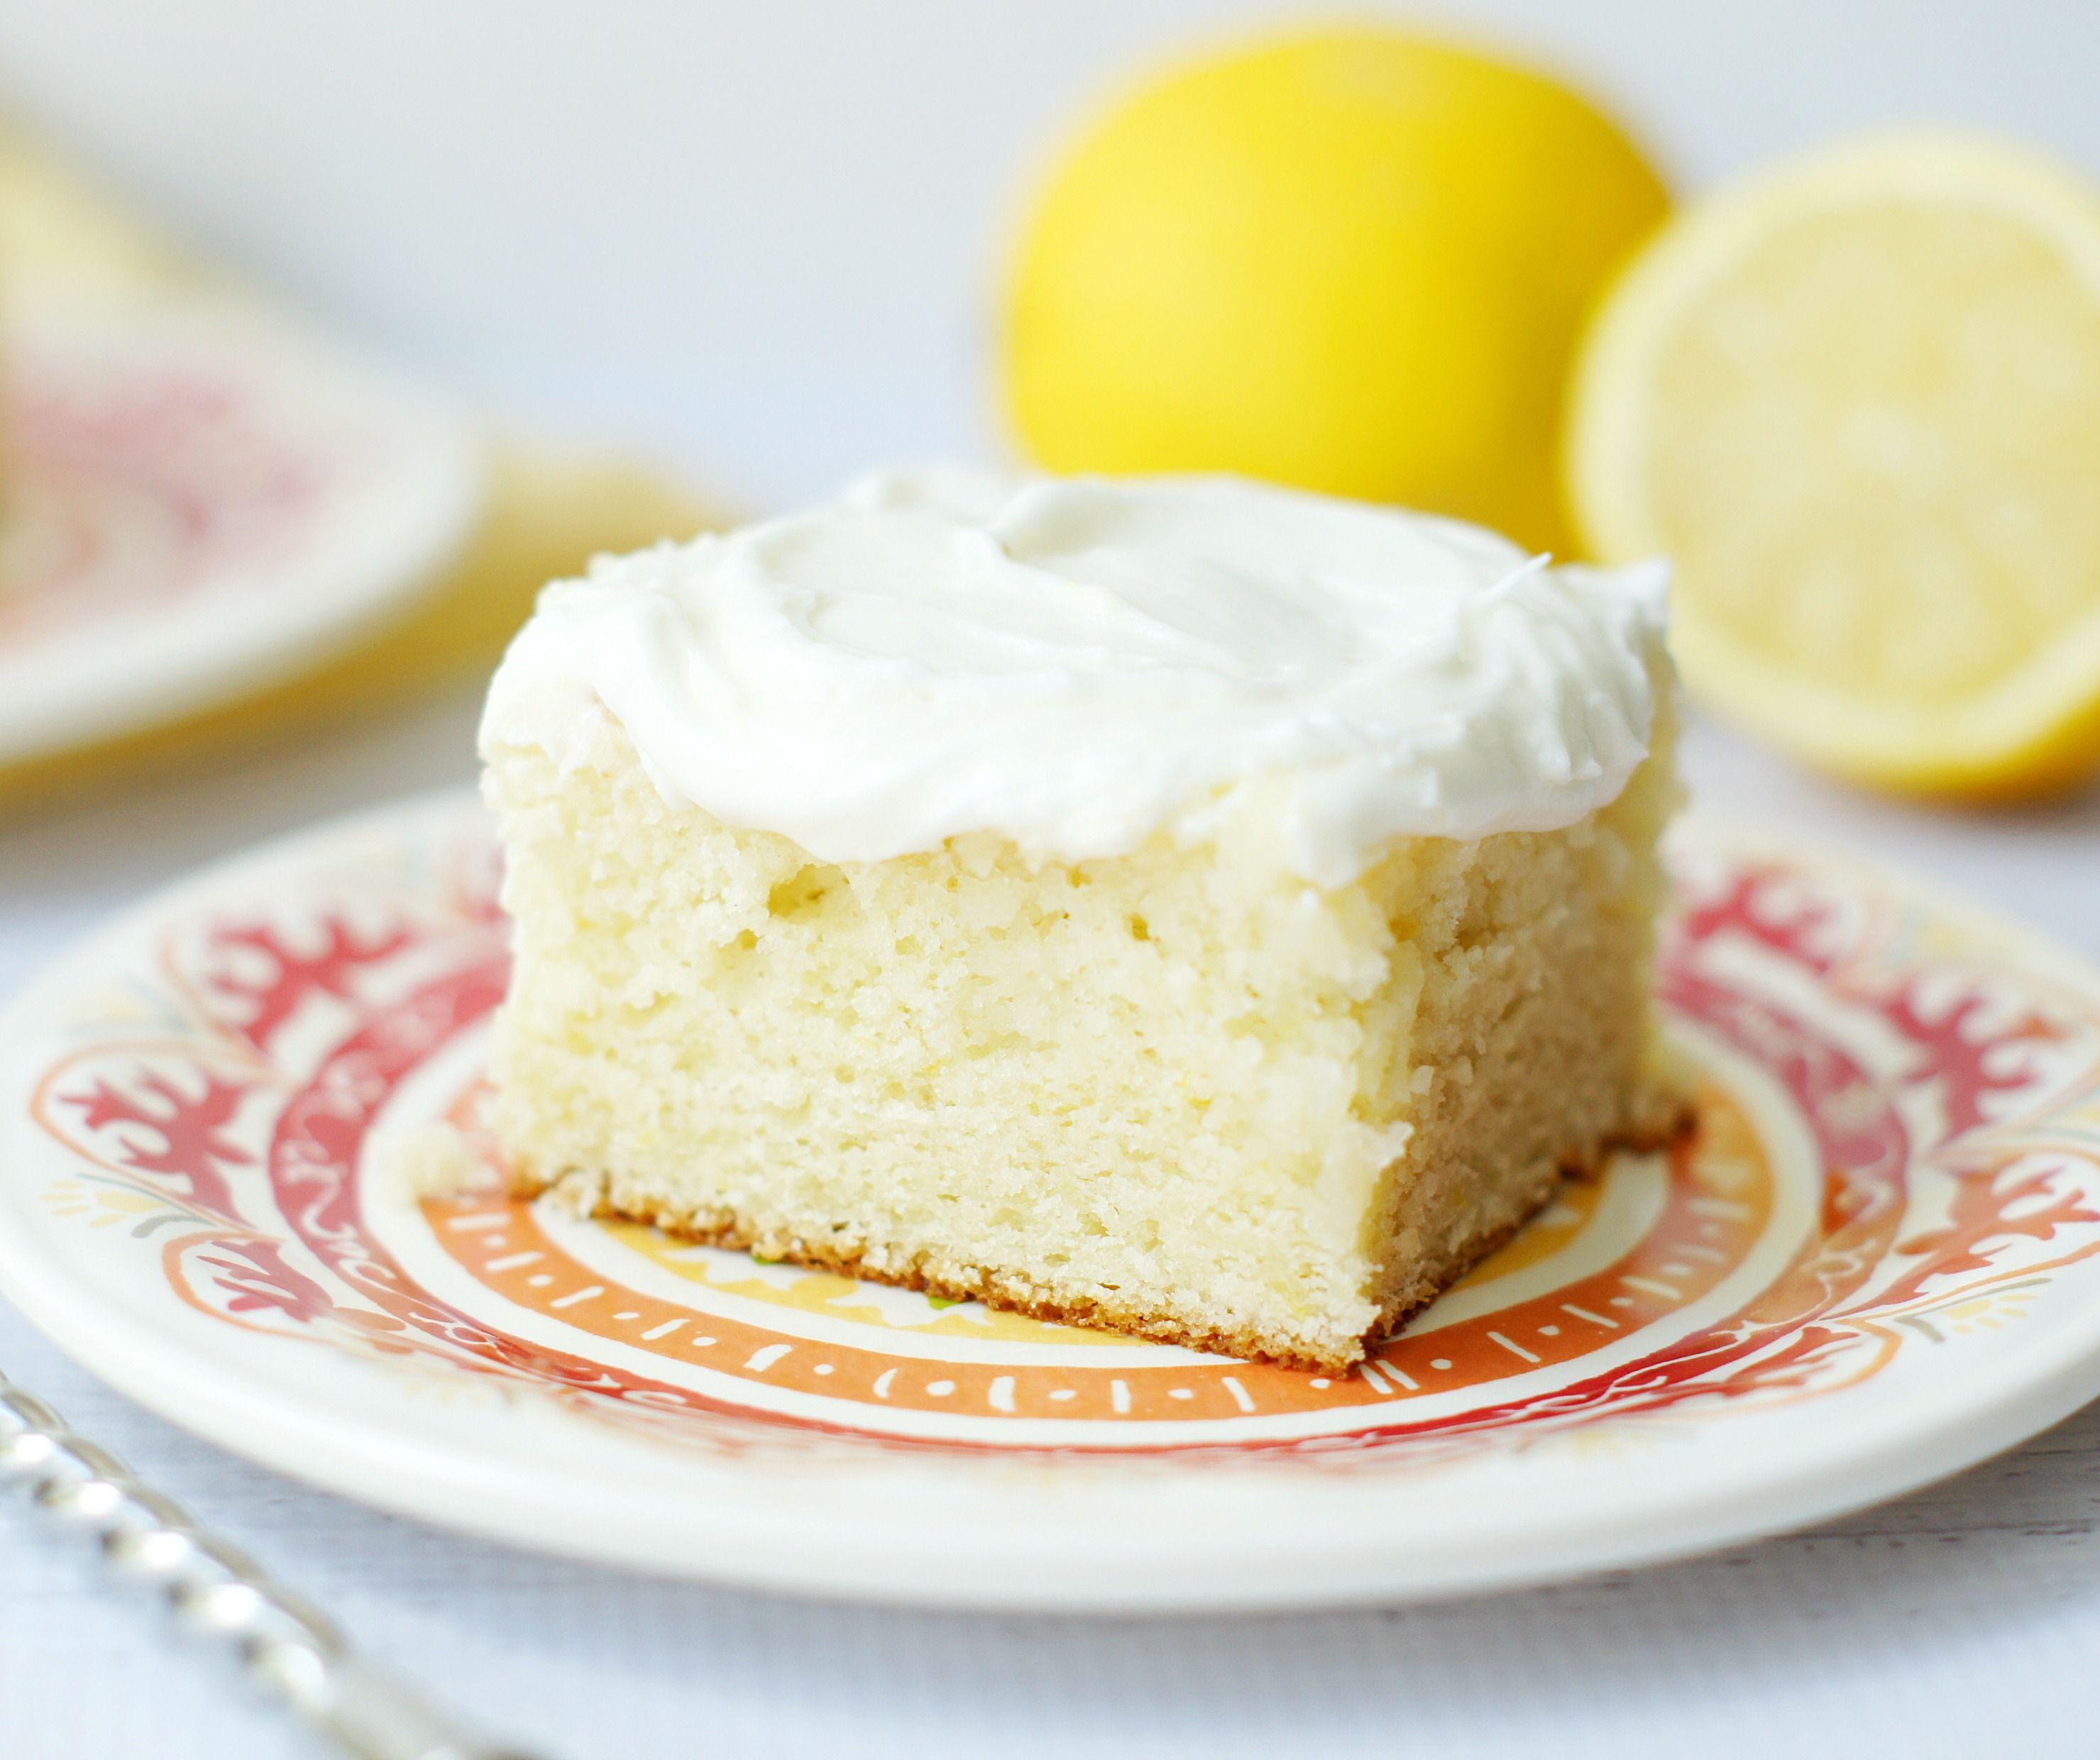 Lemon Cake With Sour Cream Lemon Icing 5 Boys Baker Recipe Sour Cream Cake Lemon Cake Recipe Lemon Icing